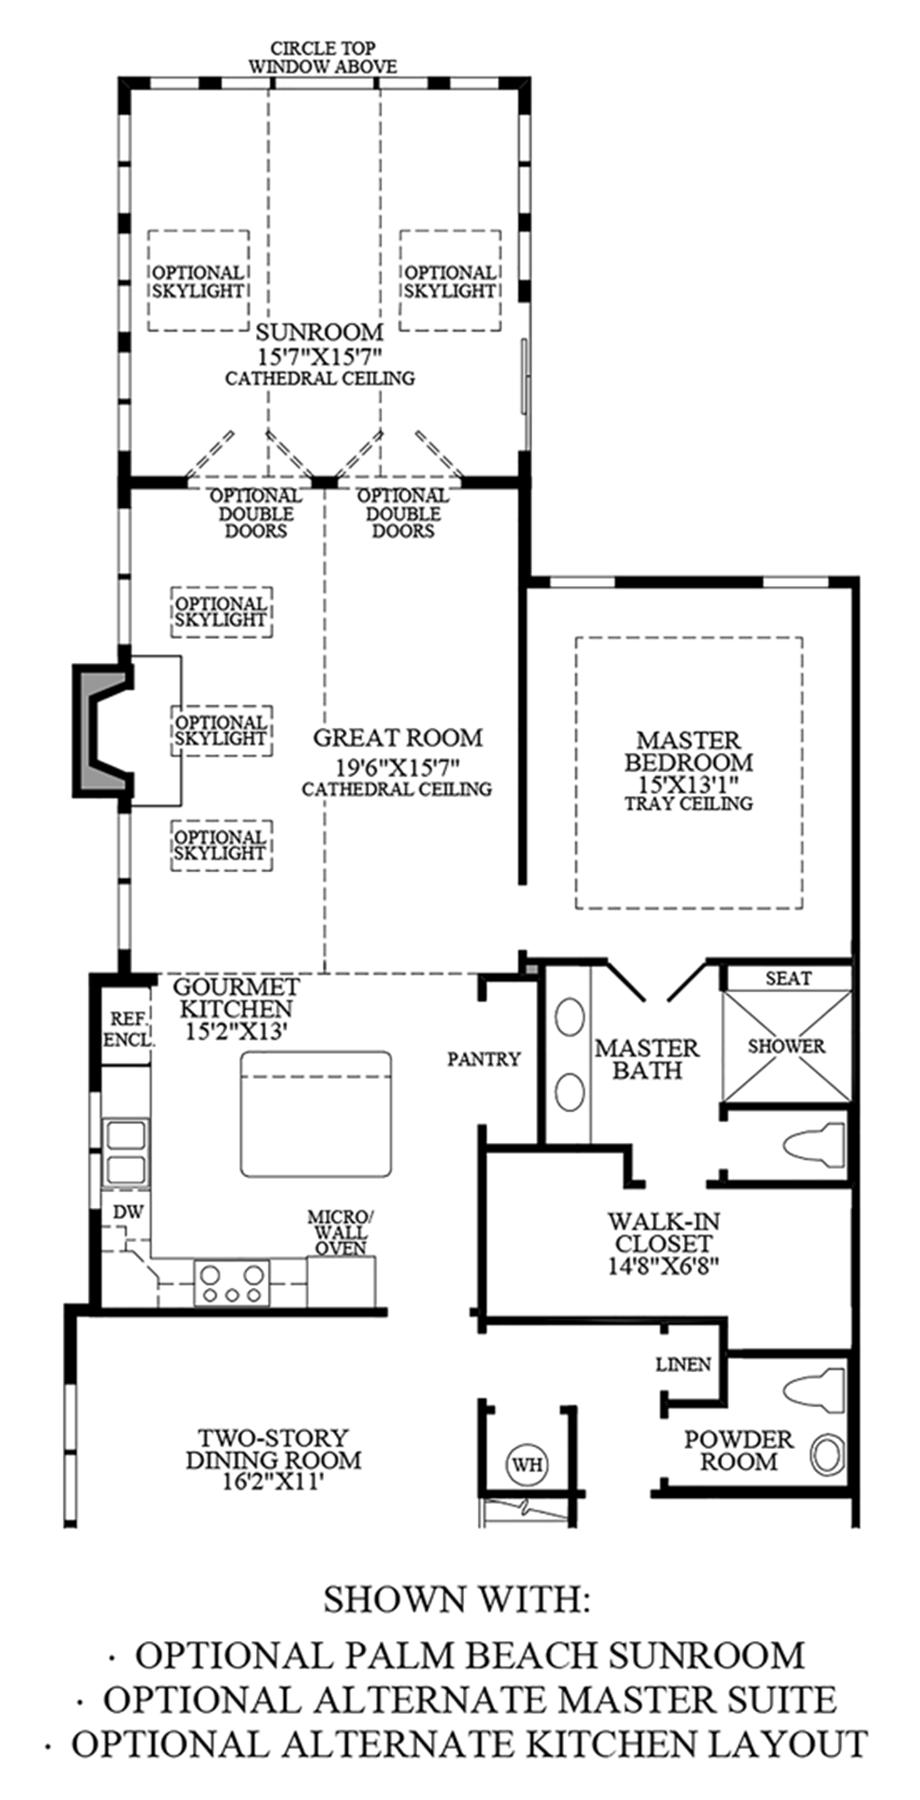 Optional Palm Beach Sunroom, Alternate Master Suite & Alternate Kitchen Layout Floor Plan